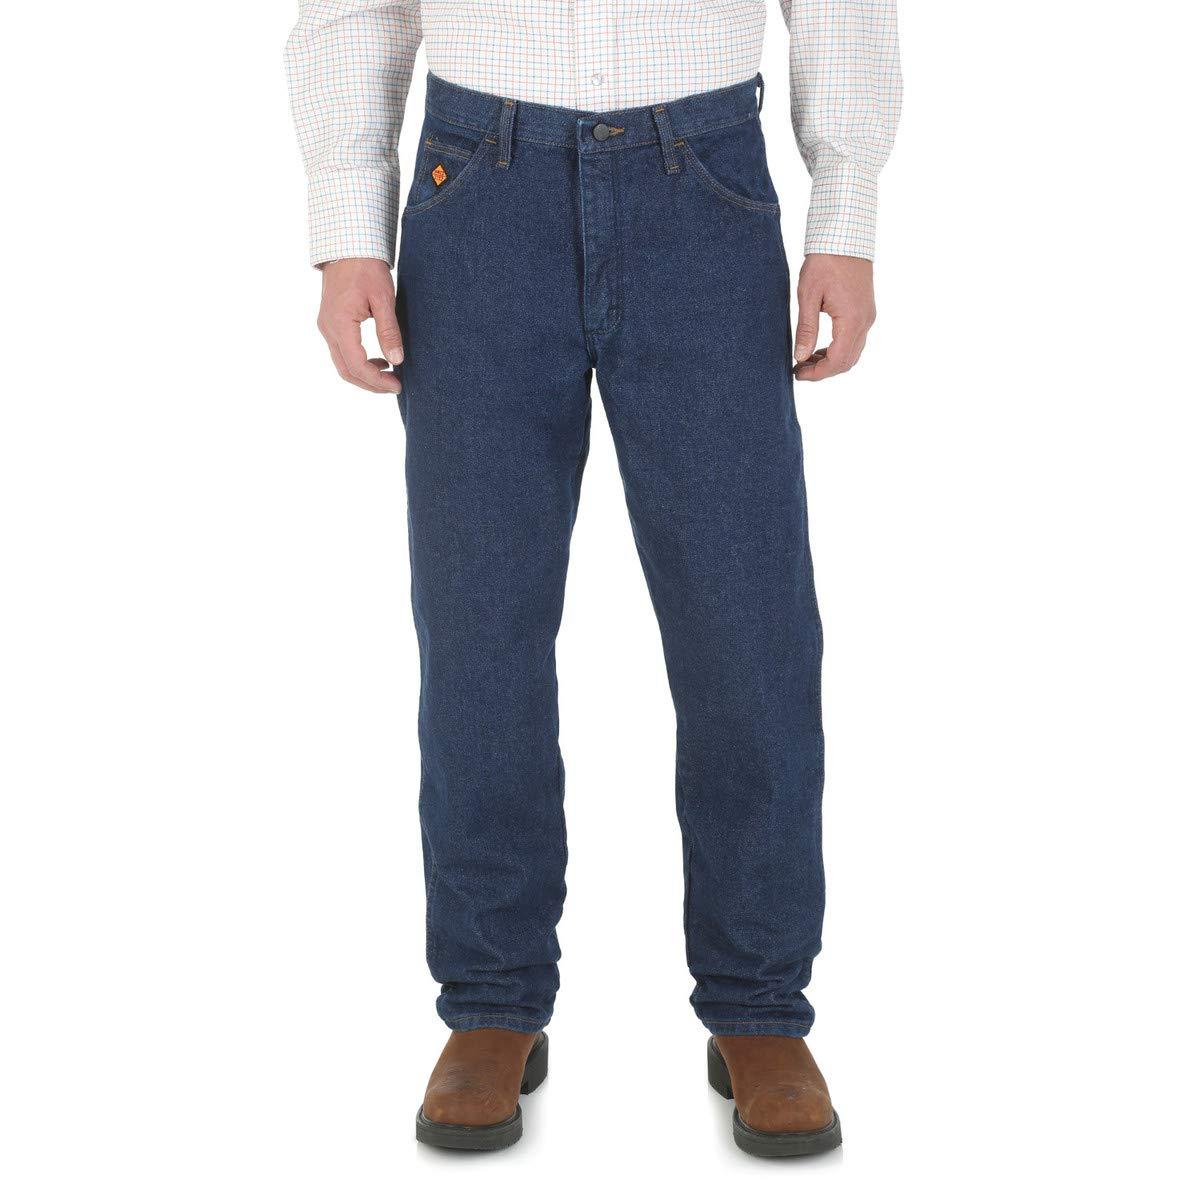 Wrangler FR 33 X 36 Prewash Denim Cotton Heavy Weight Flame Resistant Jeans With Zipper Front Closure